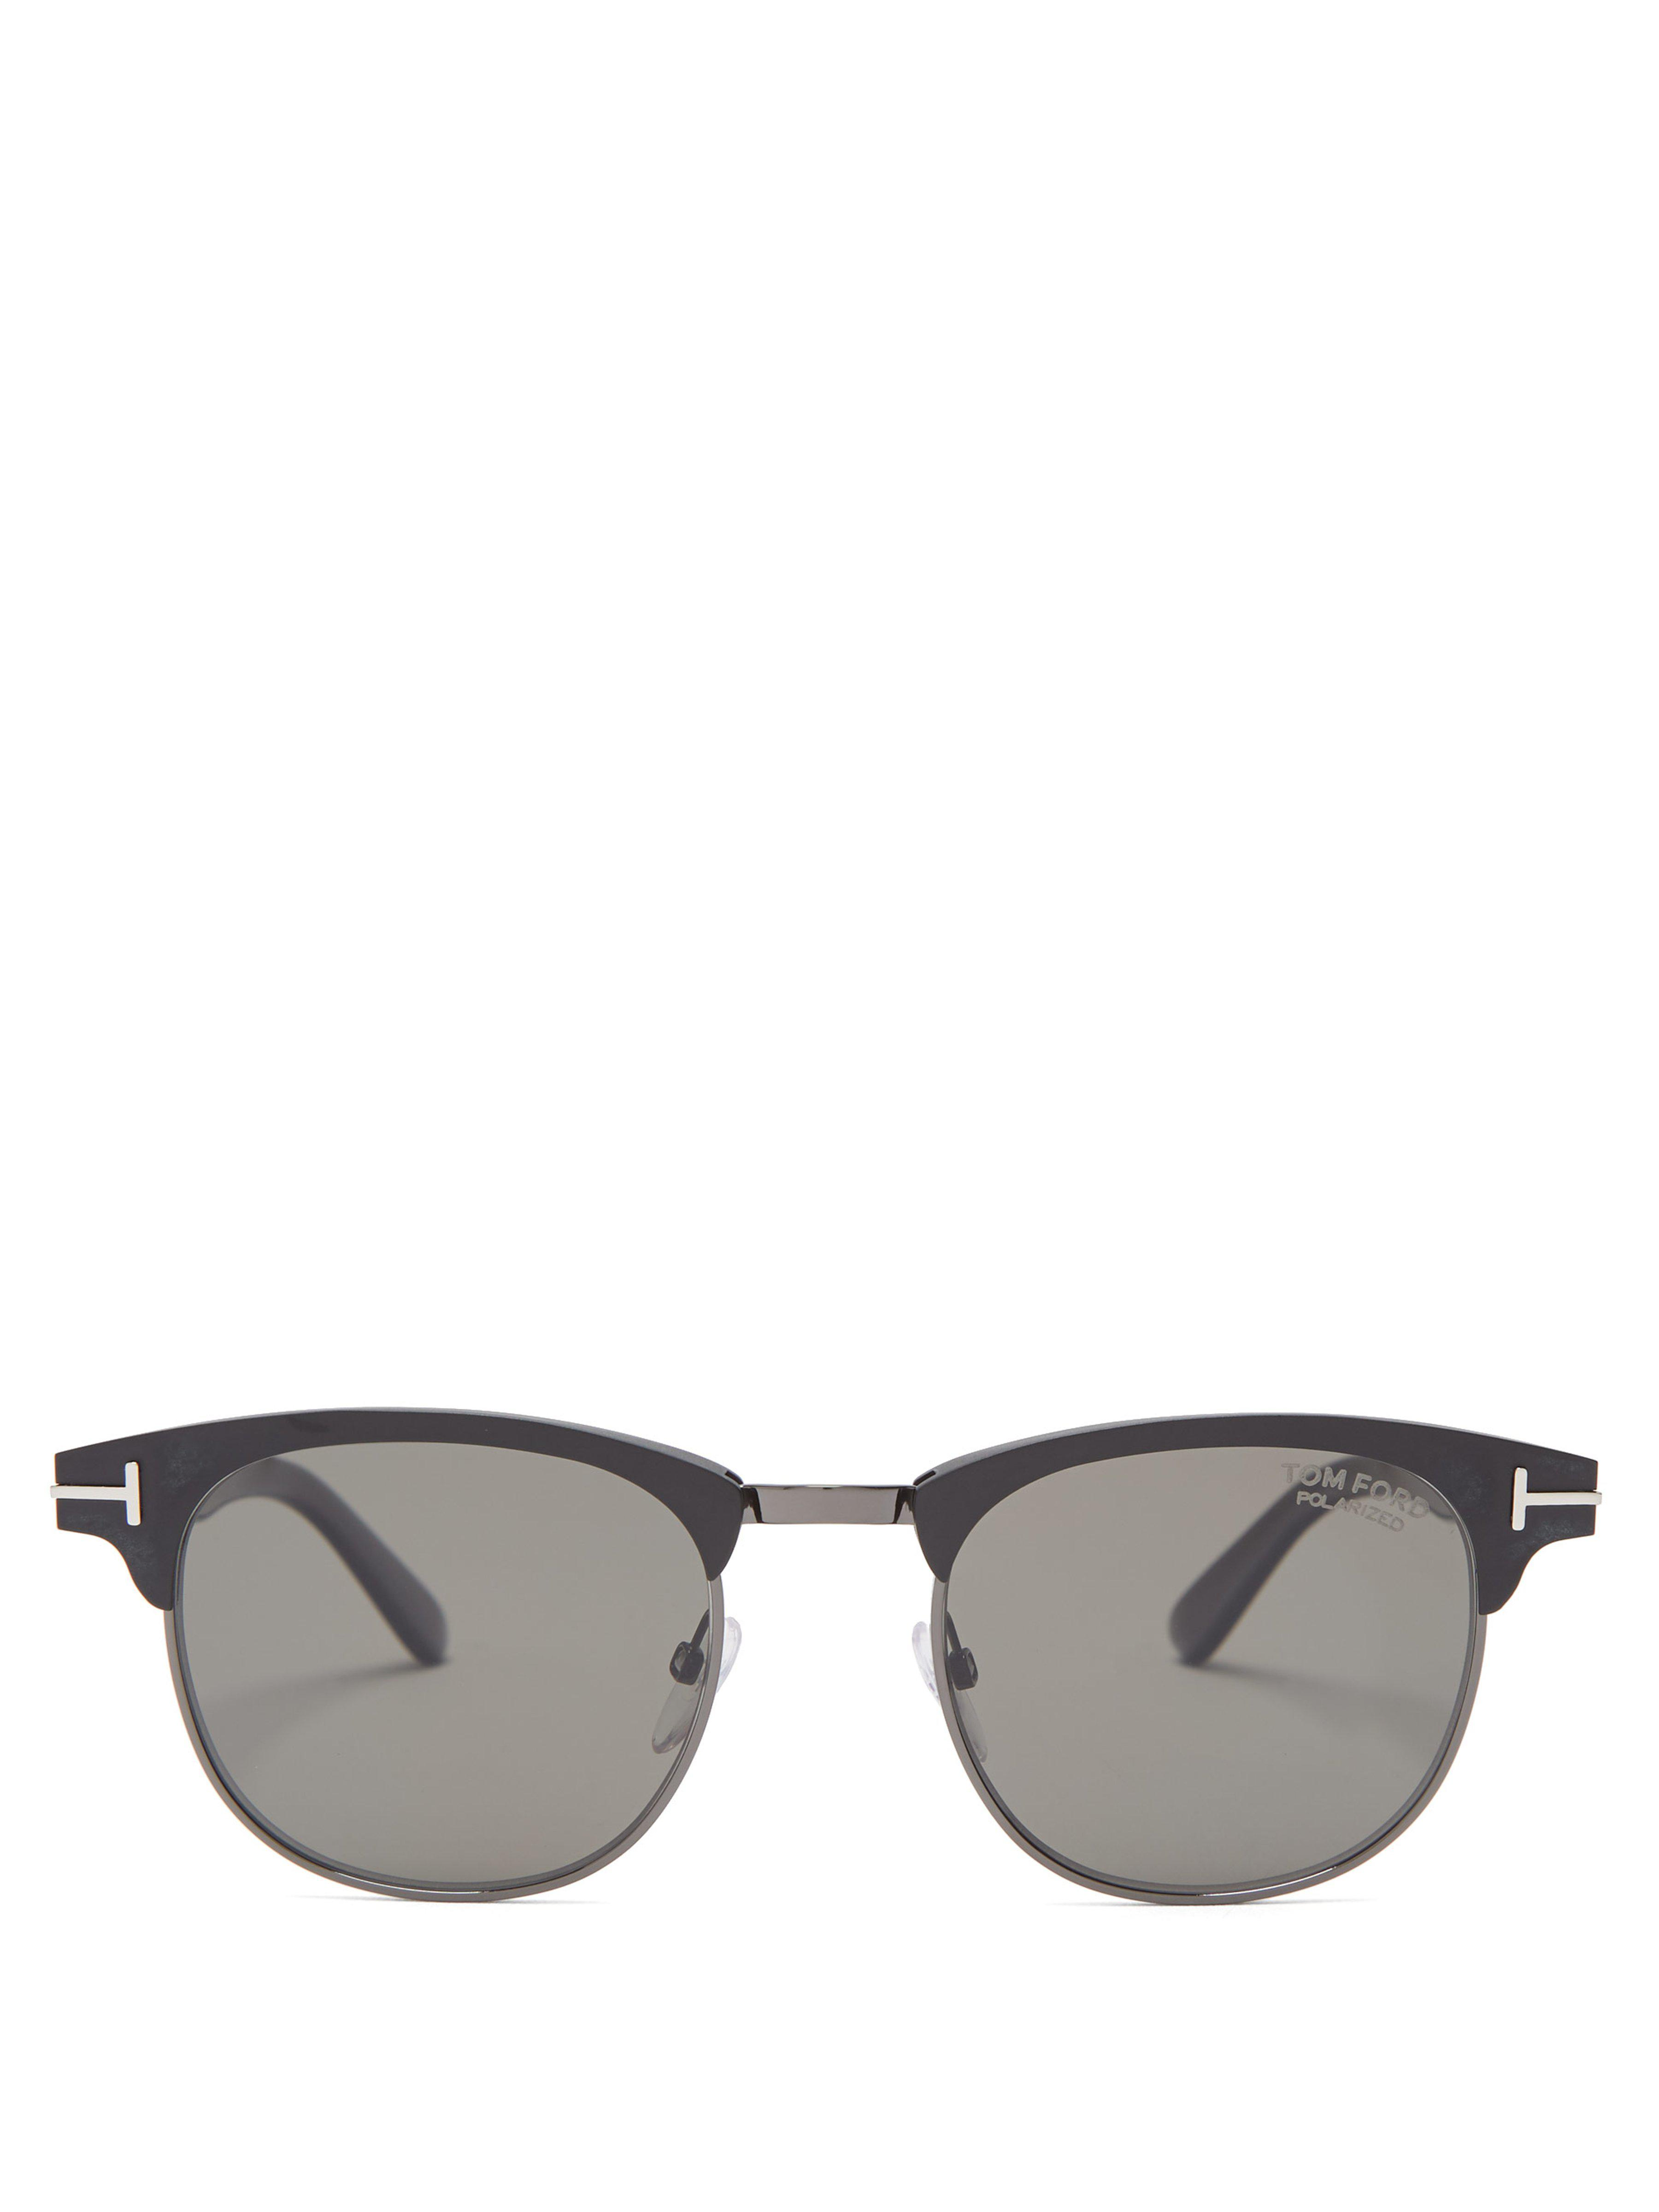 8e9c4b7d8f Tom Ford Round Frame Matte Metal Sunglasses in Black for Men - Lyst